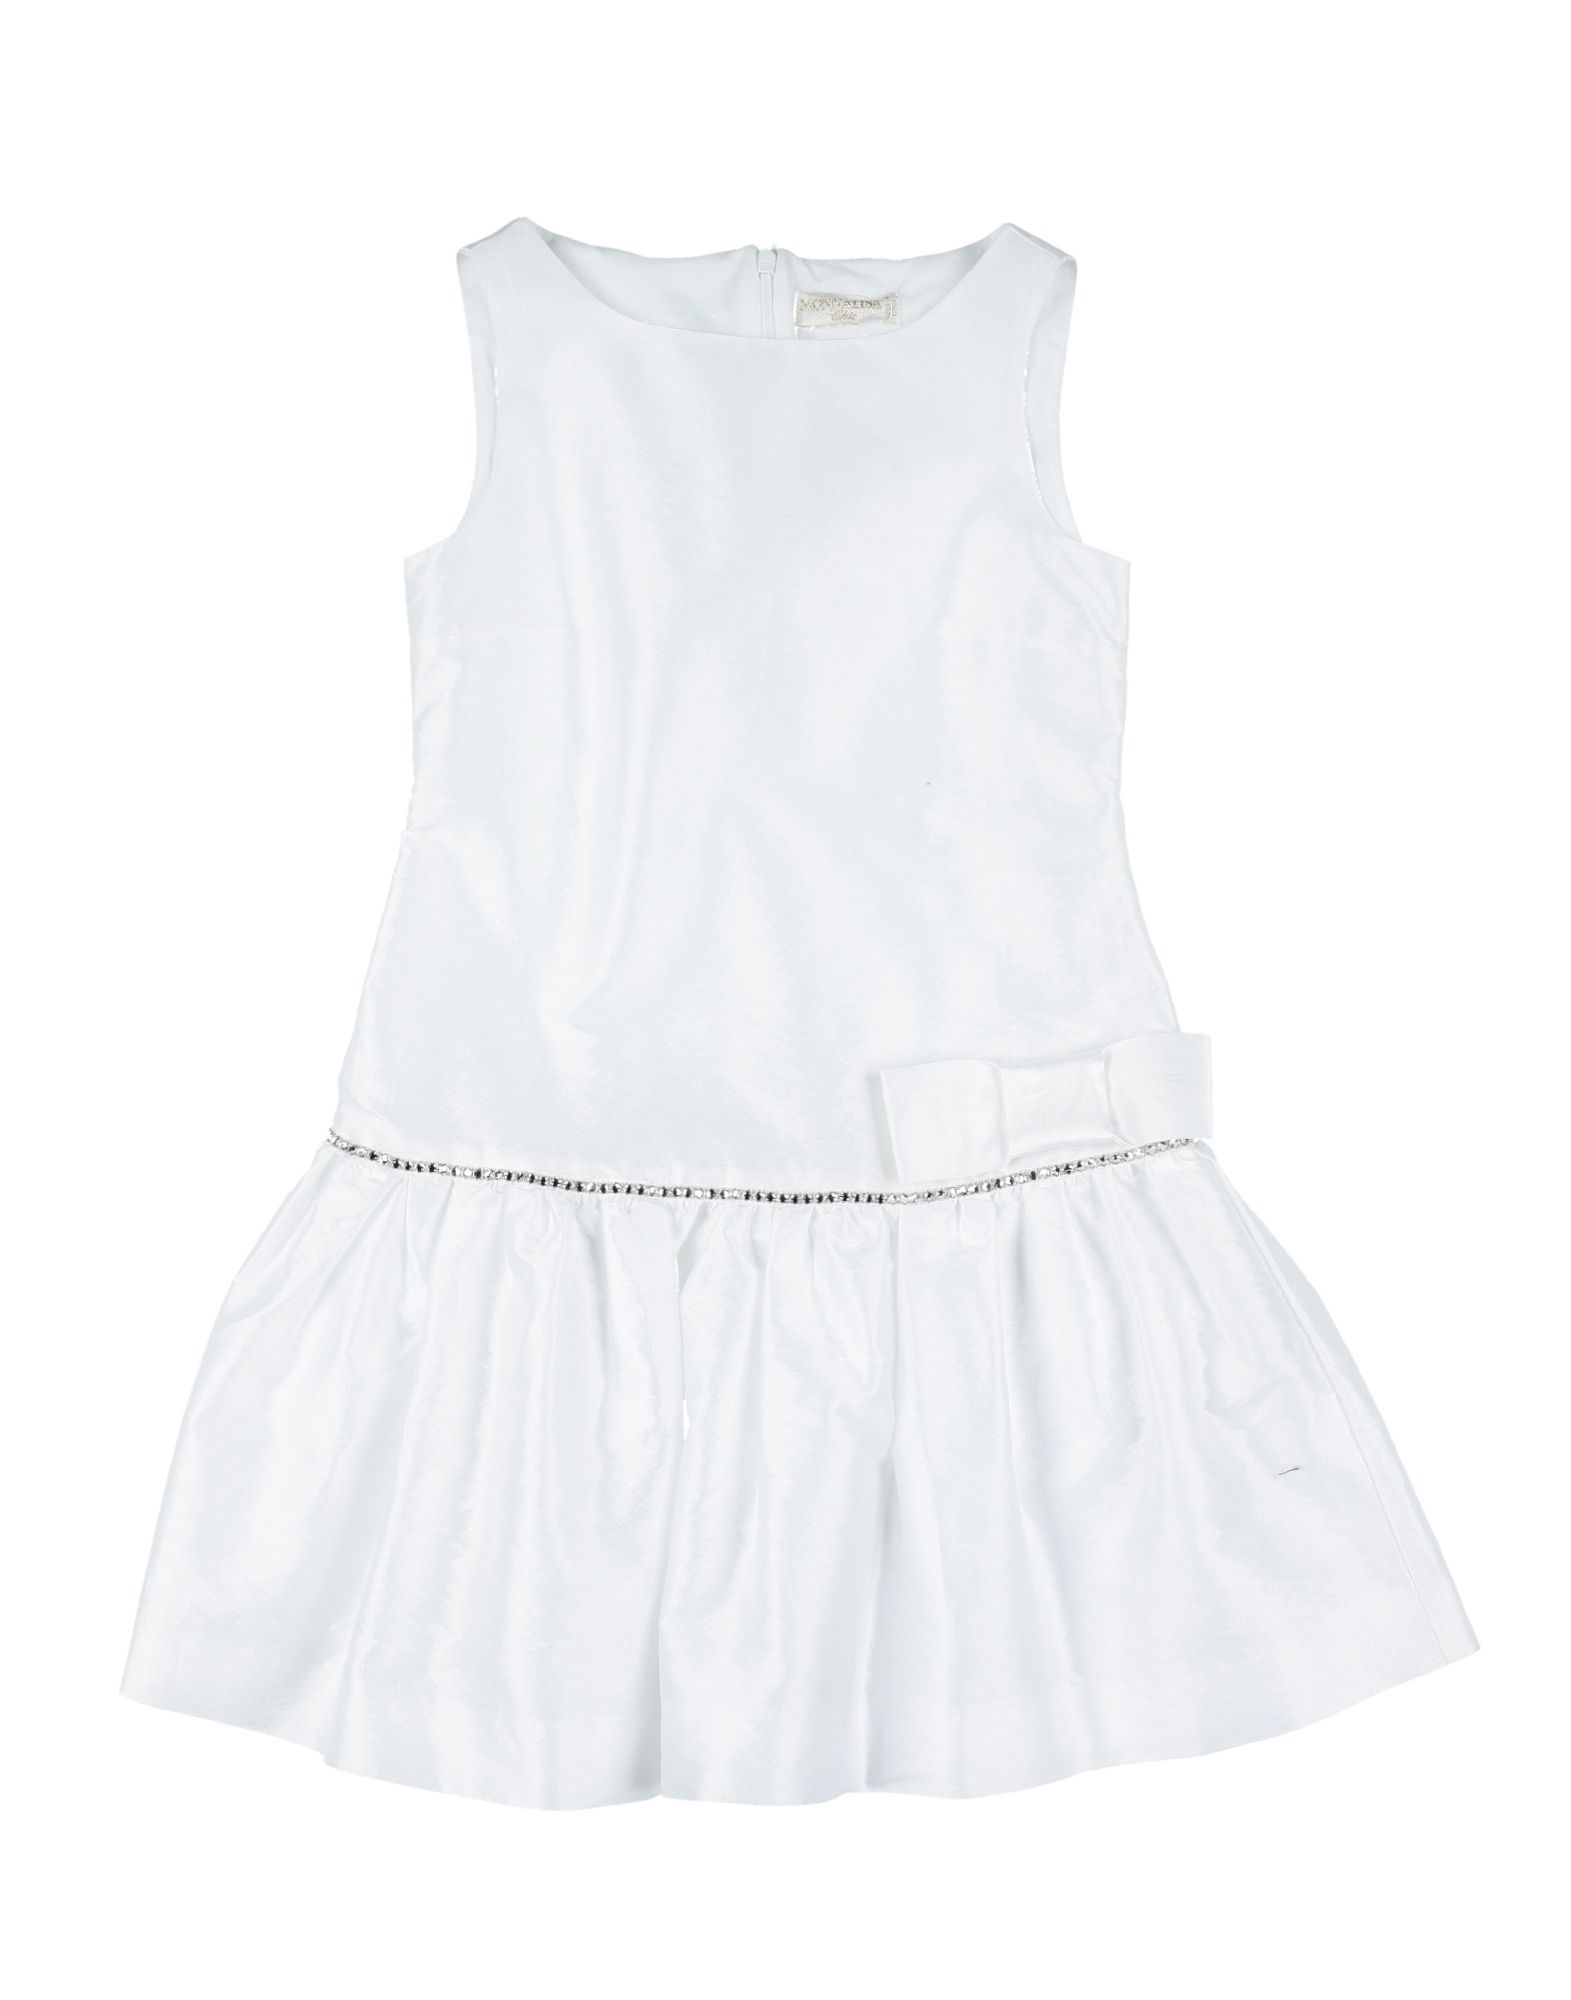 MONNALISA CHIC Dresses